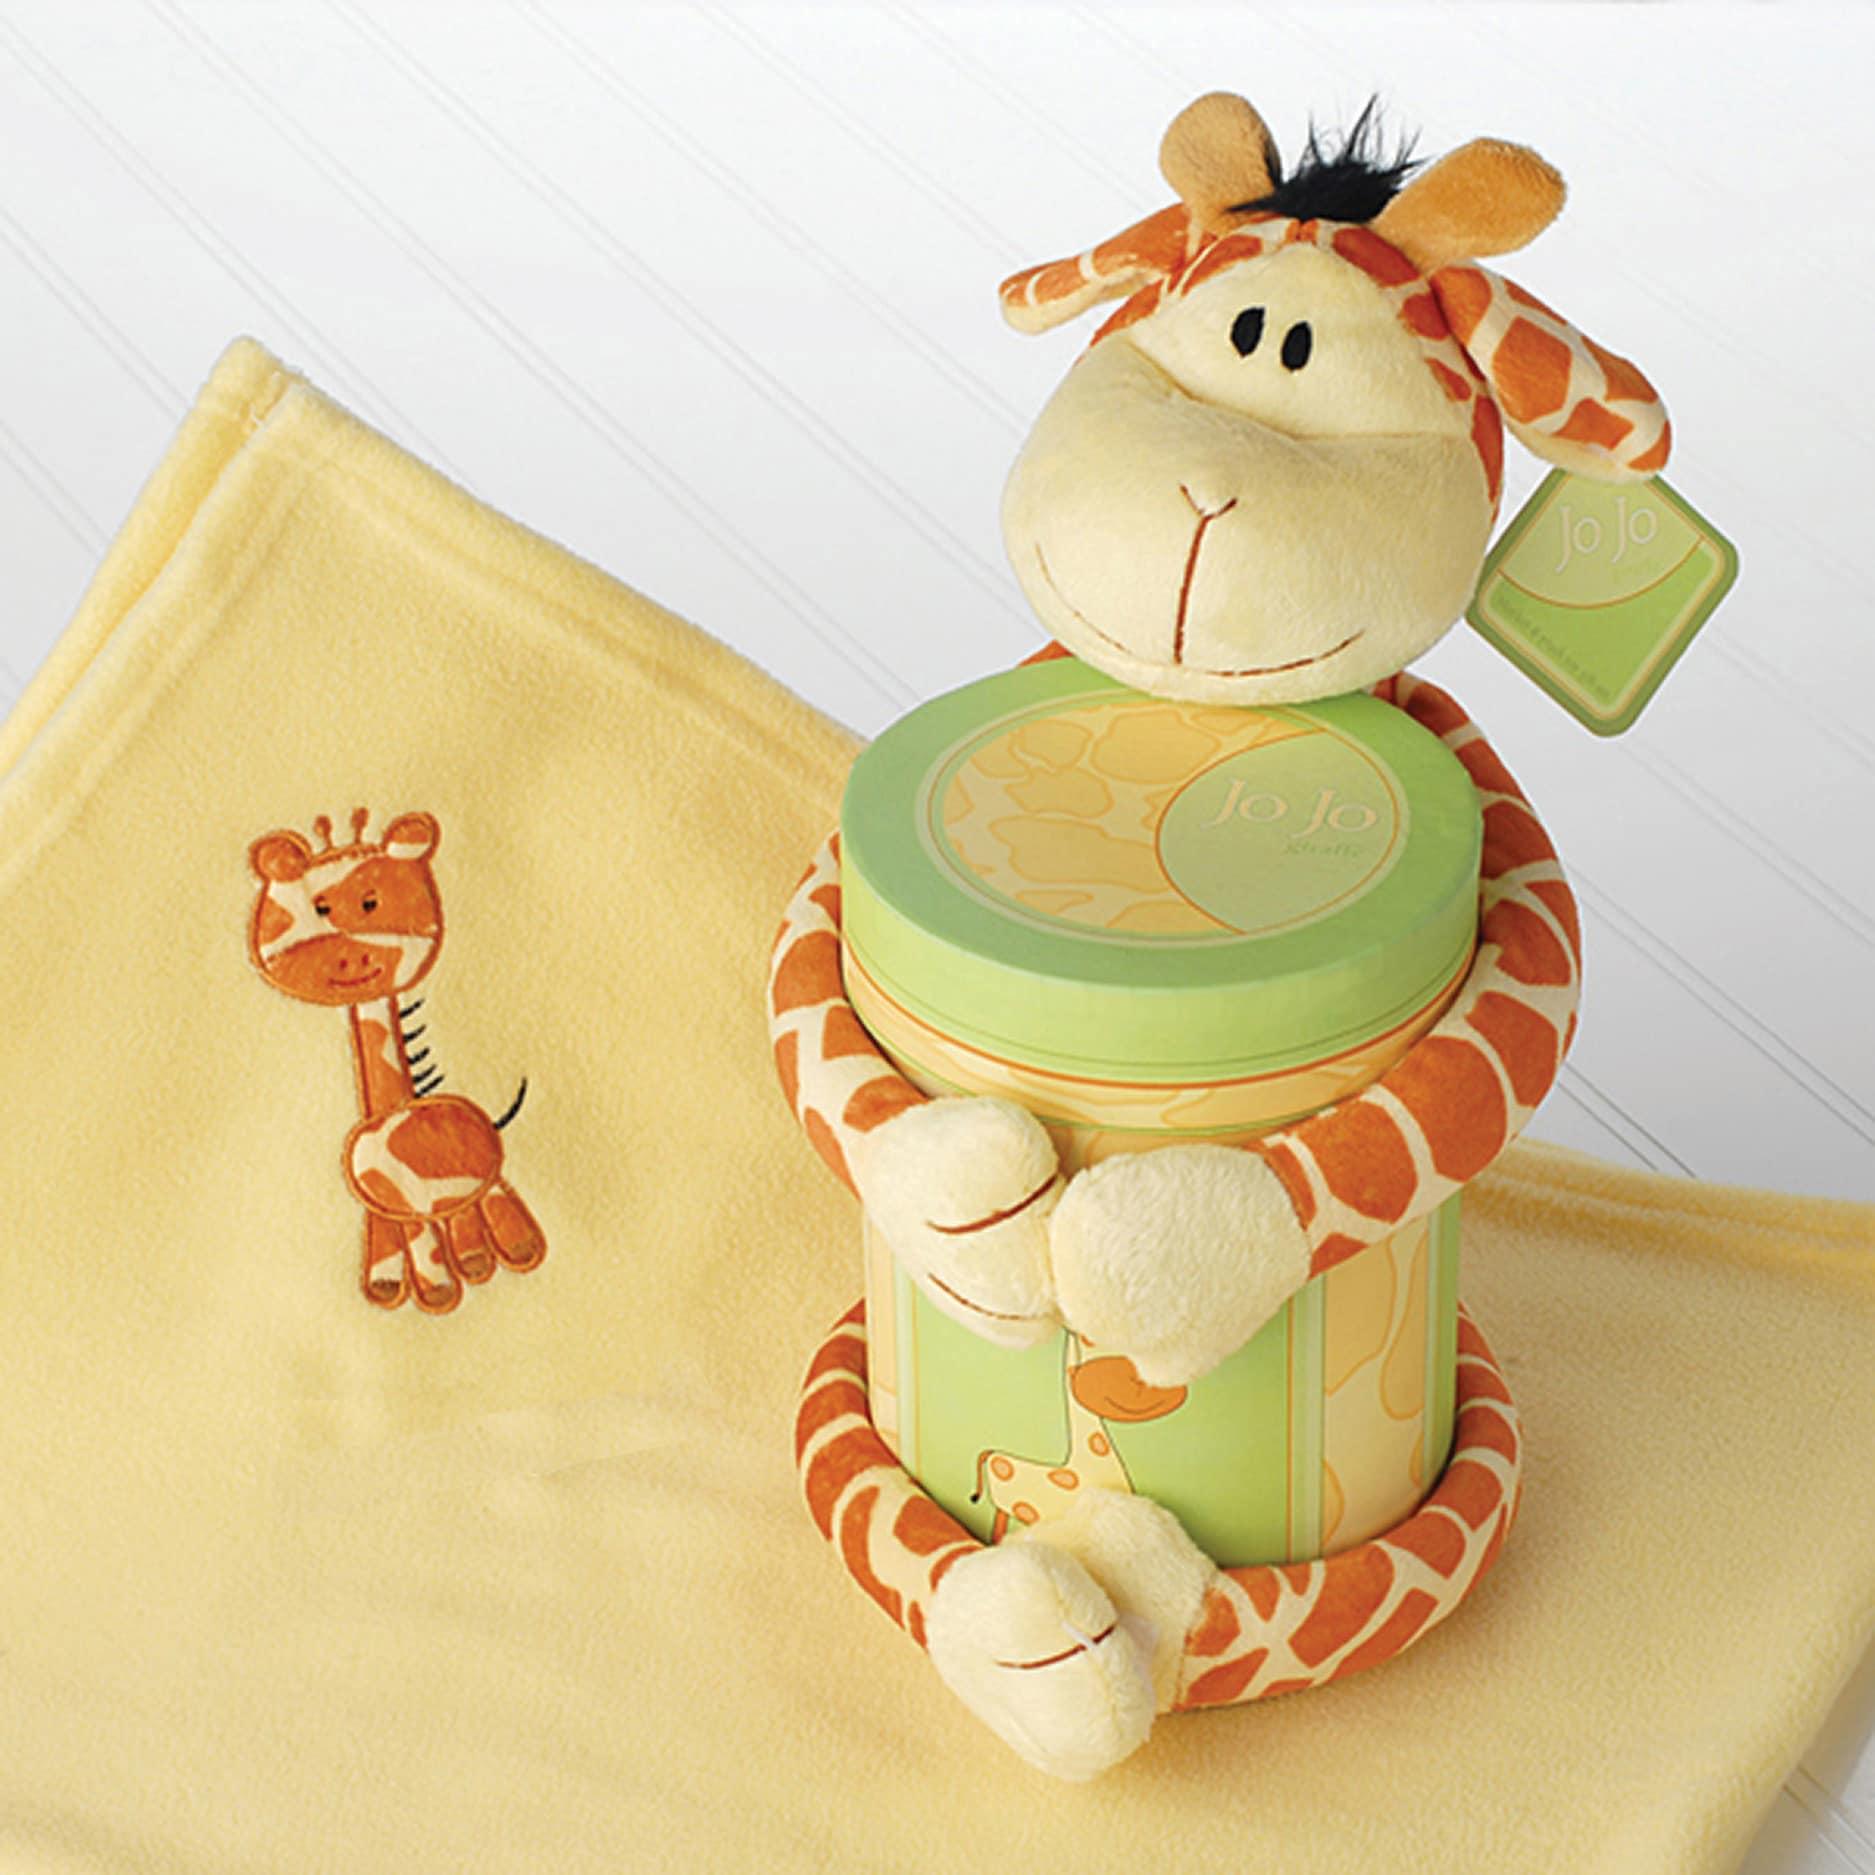 Baby Aspen 'Jo Jo Giraffe' 2-piece Plush Gift Set